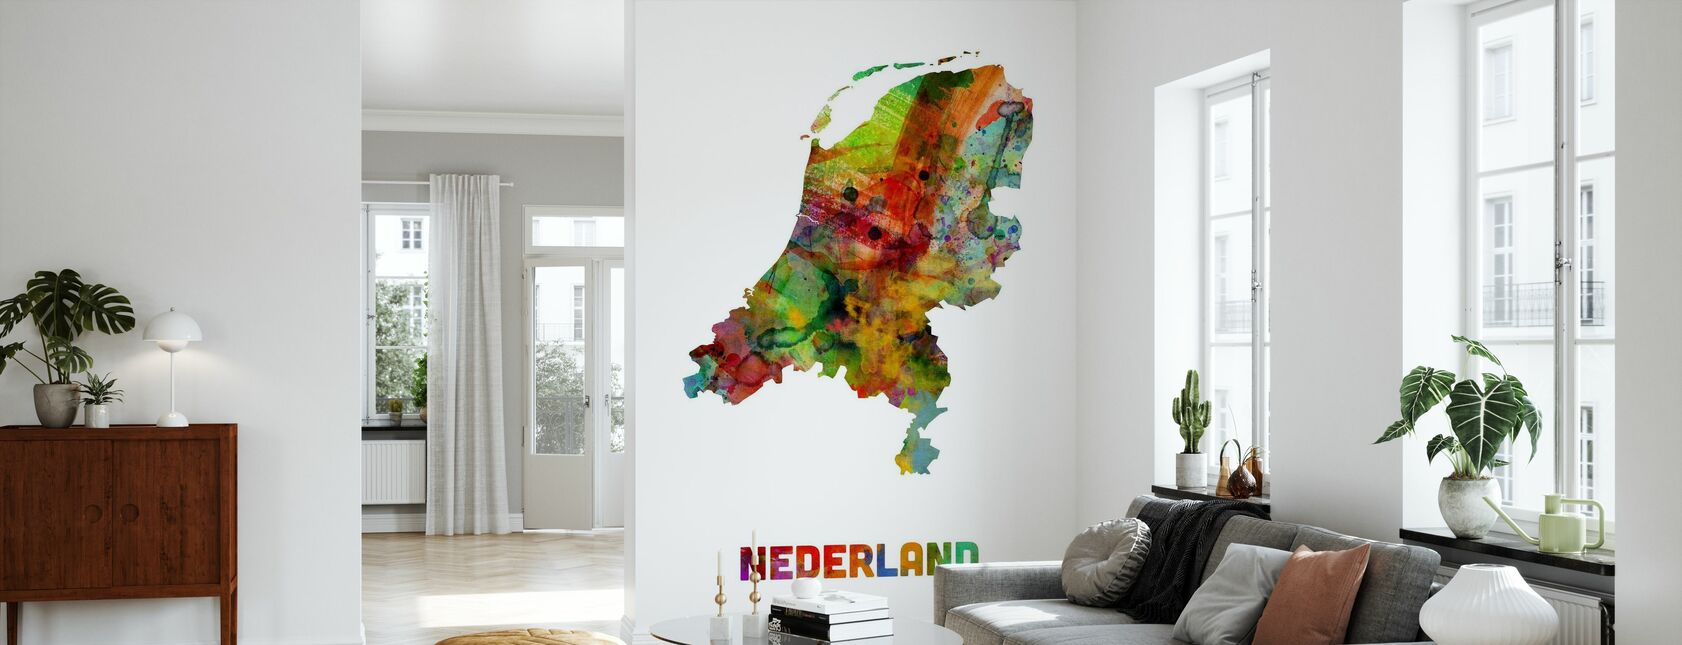 Netherlands Watercolor Map - Wallpaper - Living Room